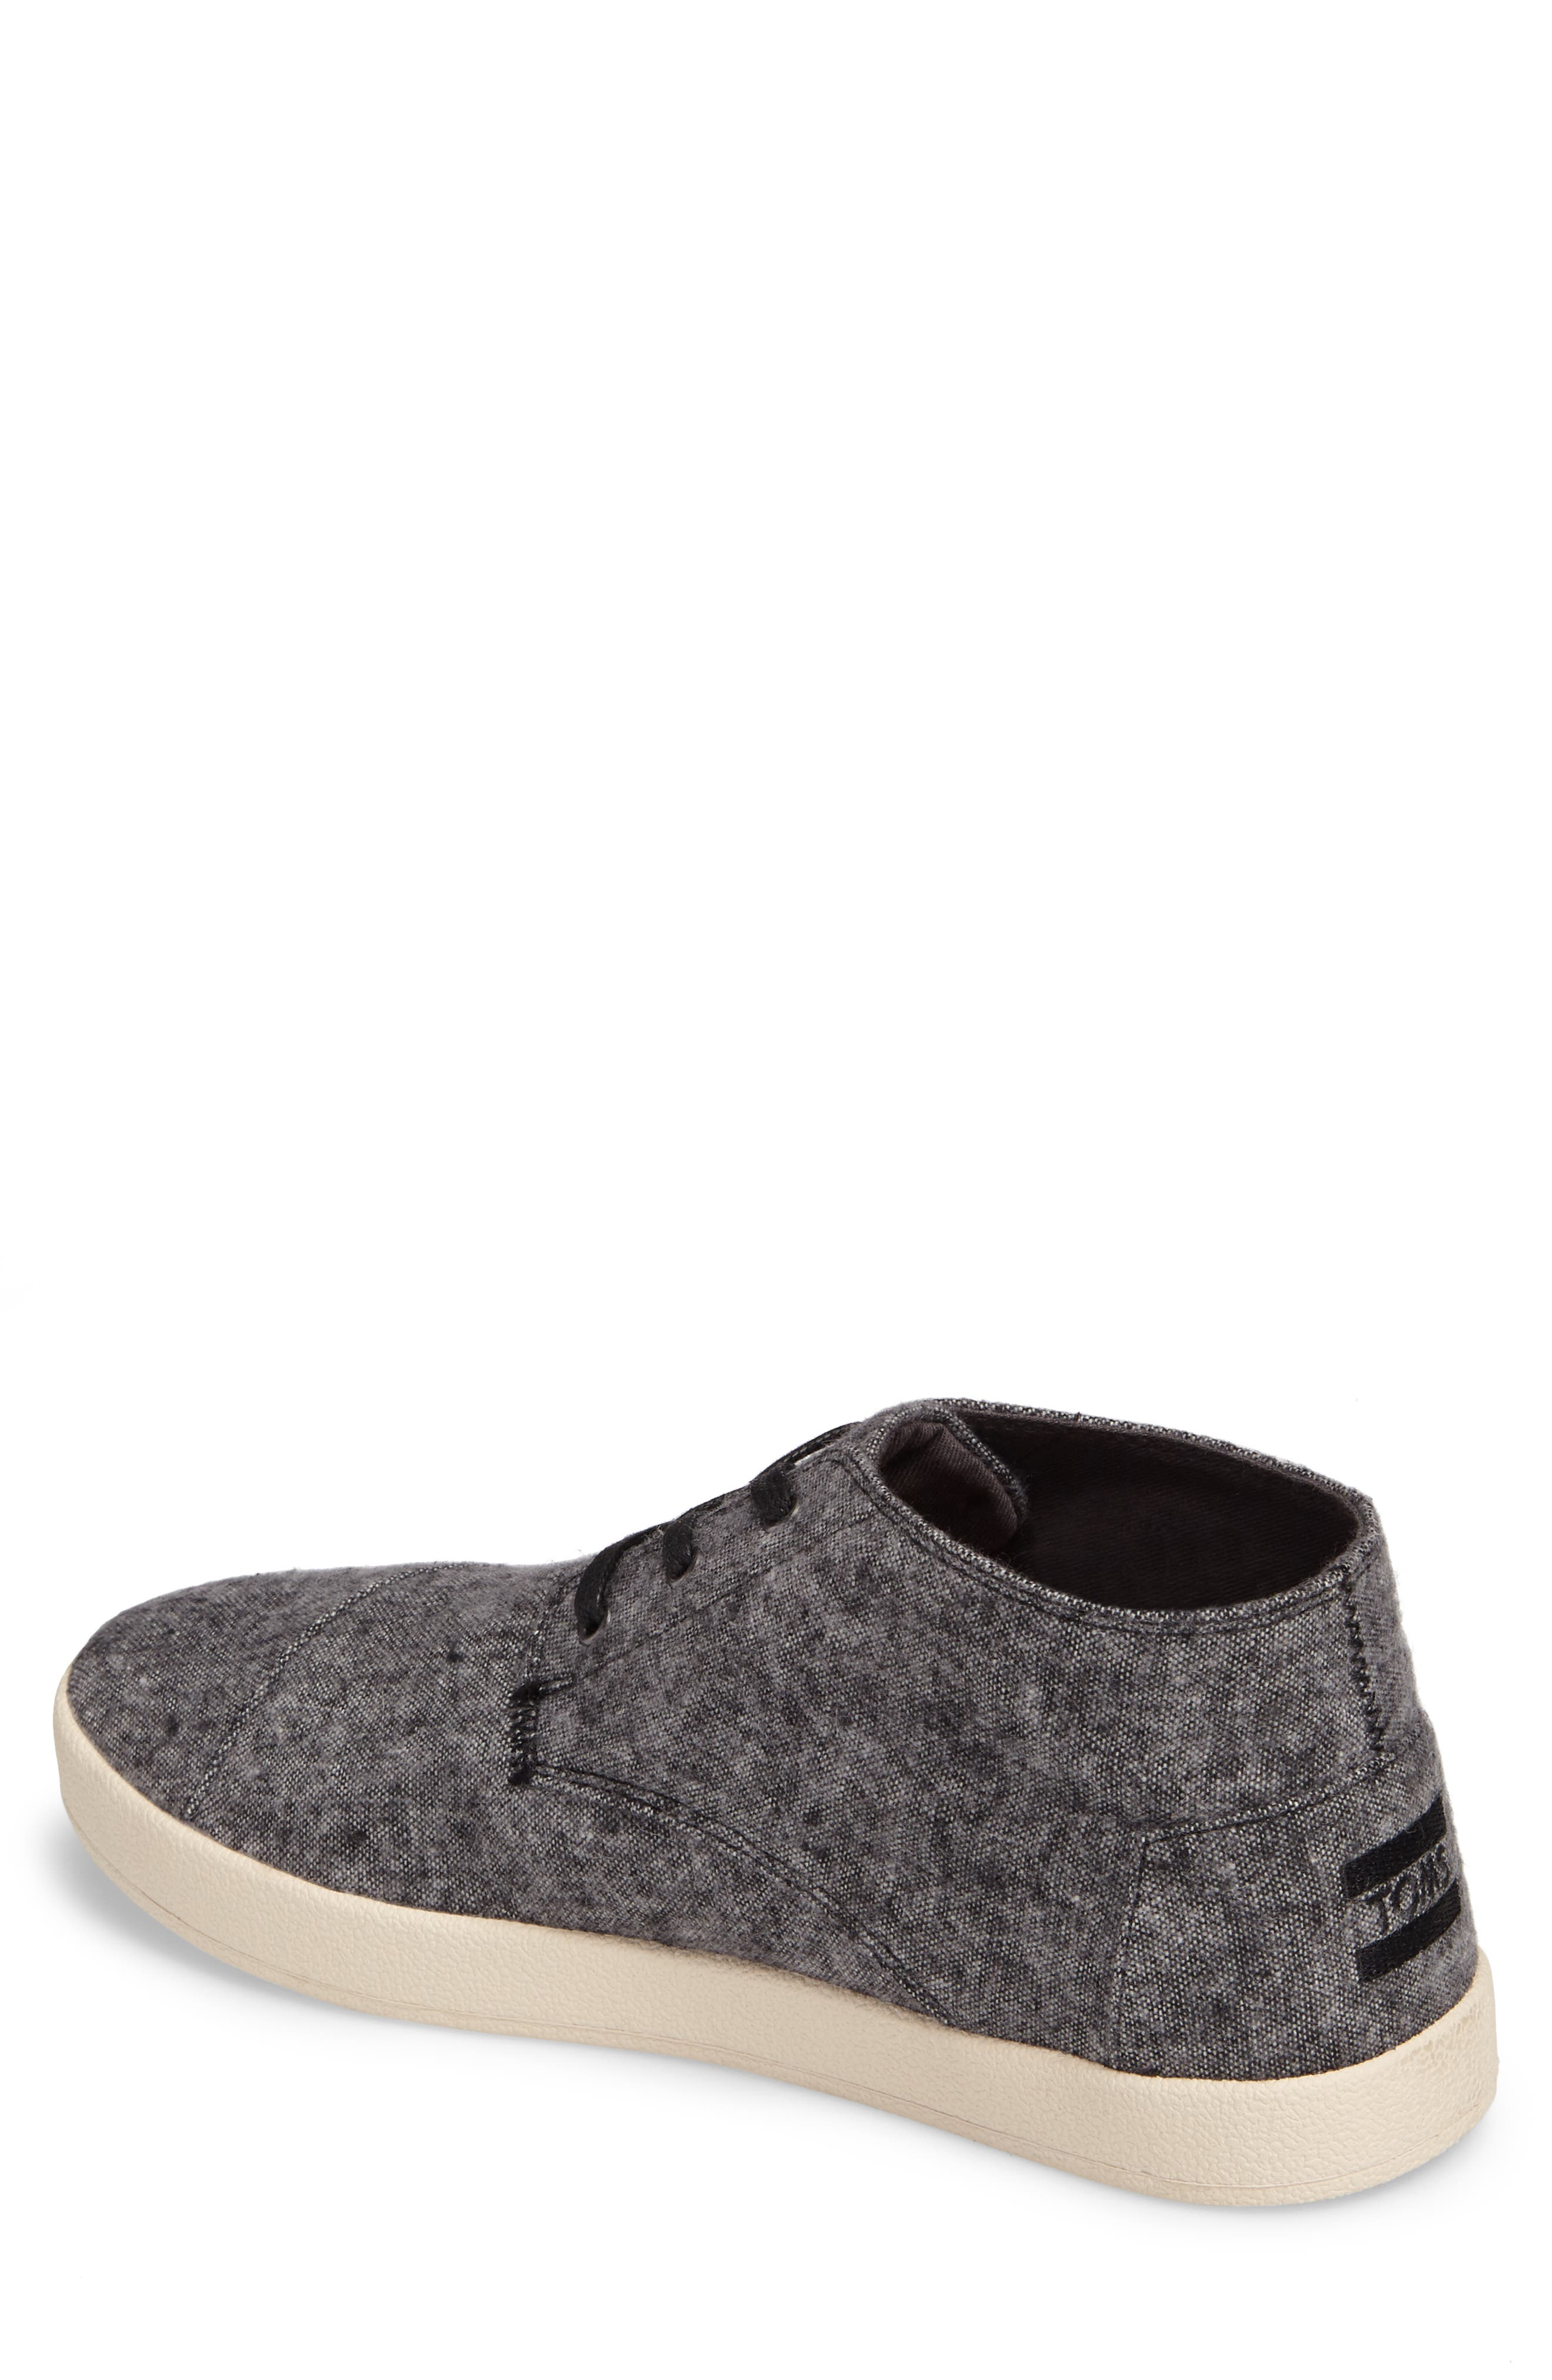 'Paseo Mid' Sneaker,                             Alternate thumbnail 2, color,                             Grey/Grey